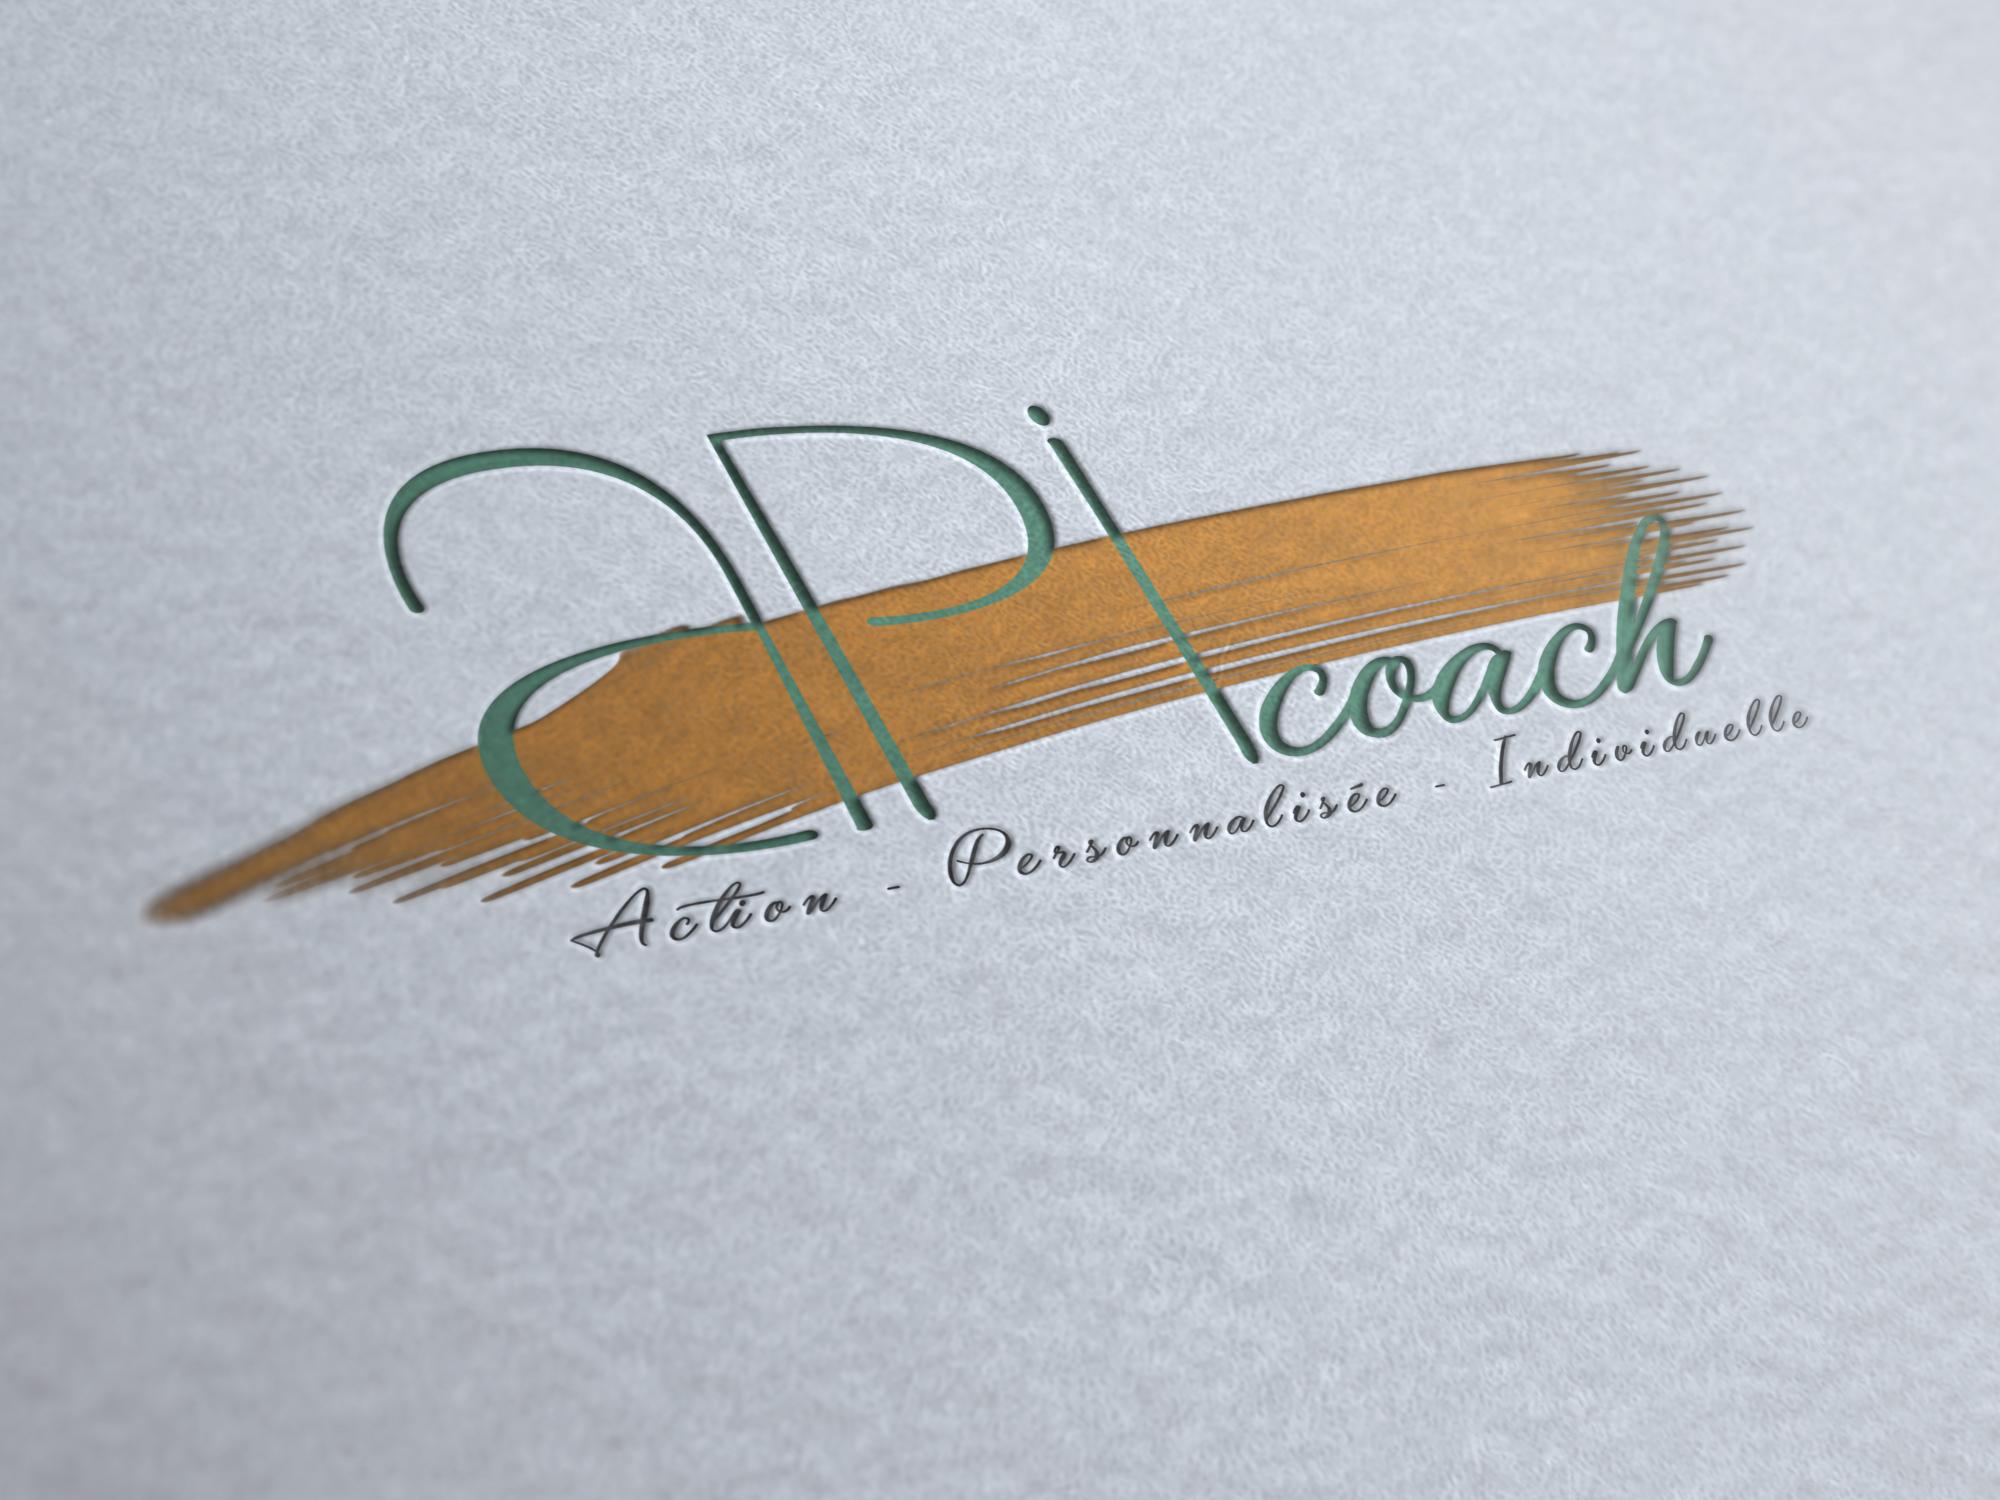 apicoach_logo_1